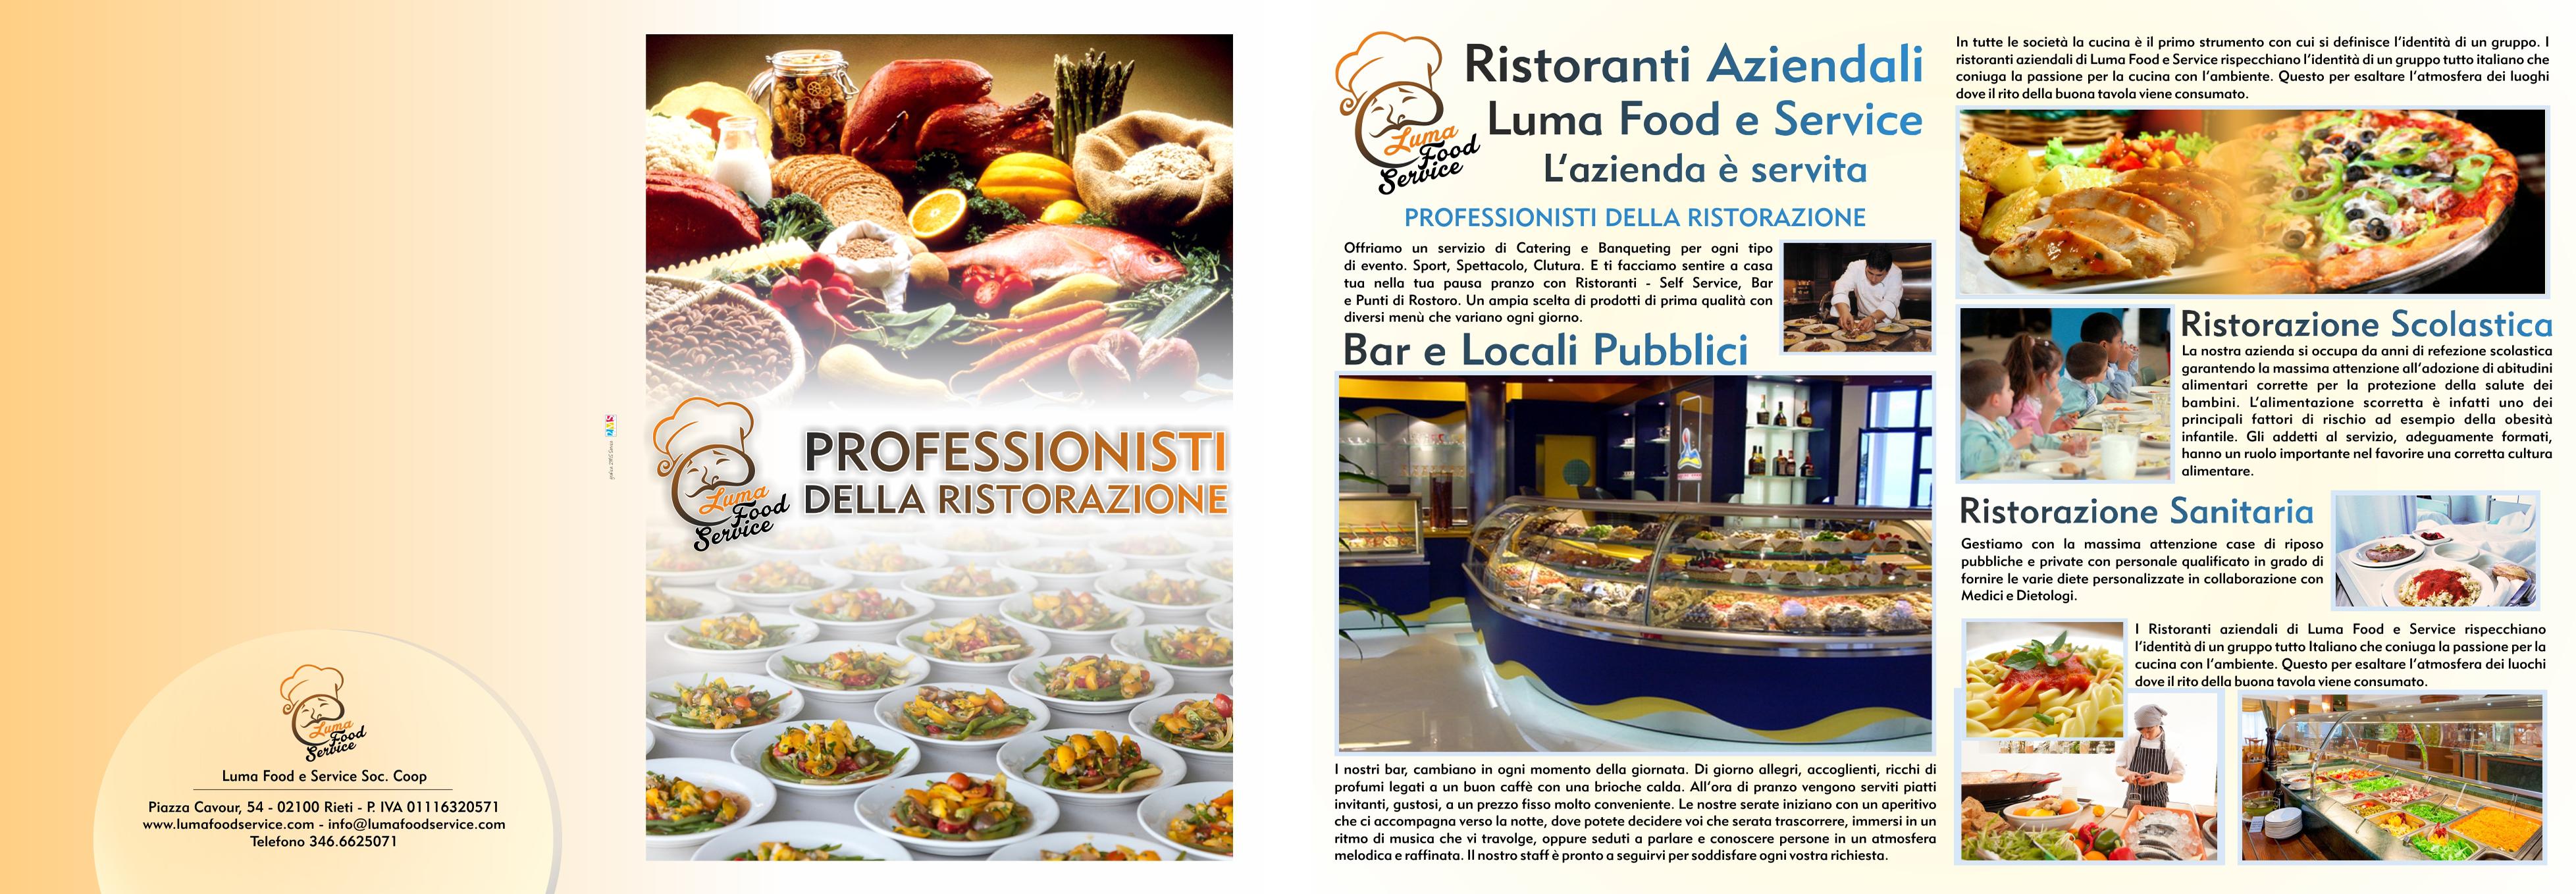 brochure-luma-food-e-service-2